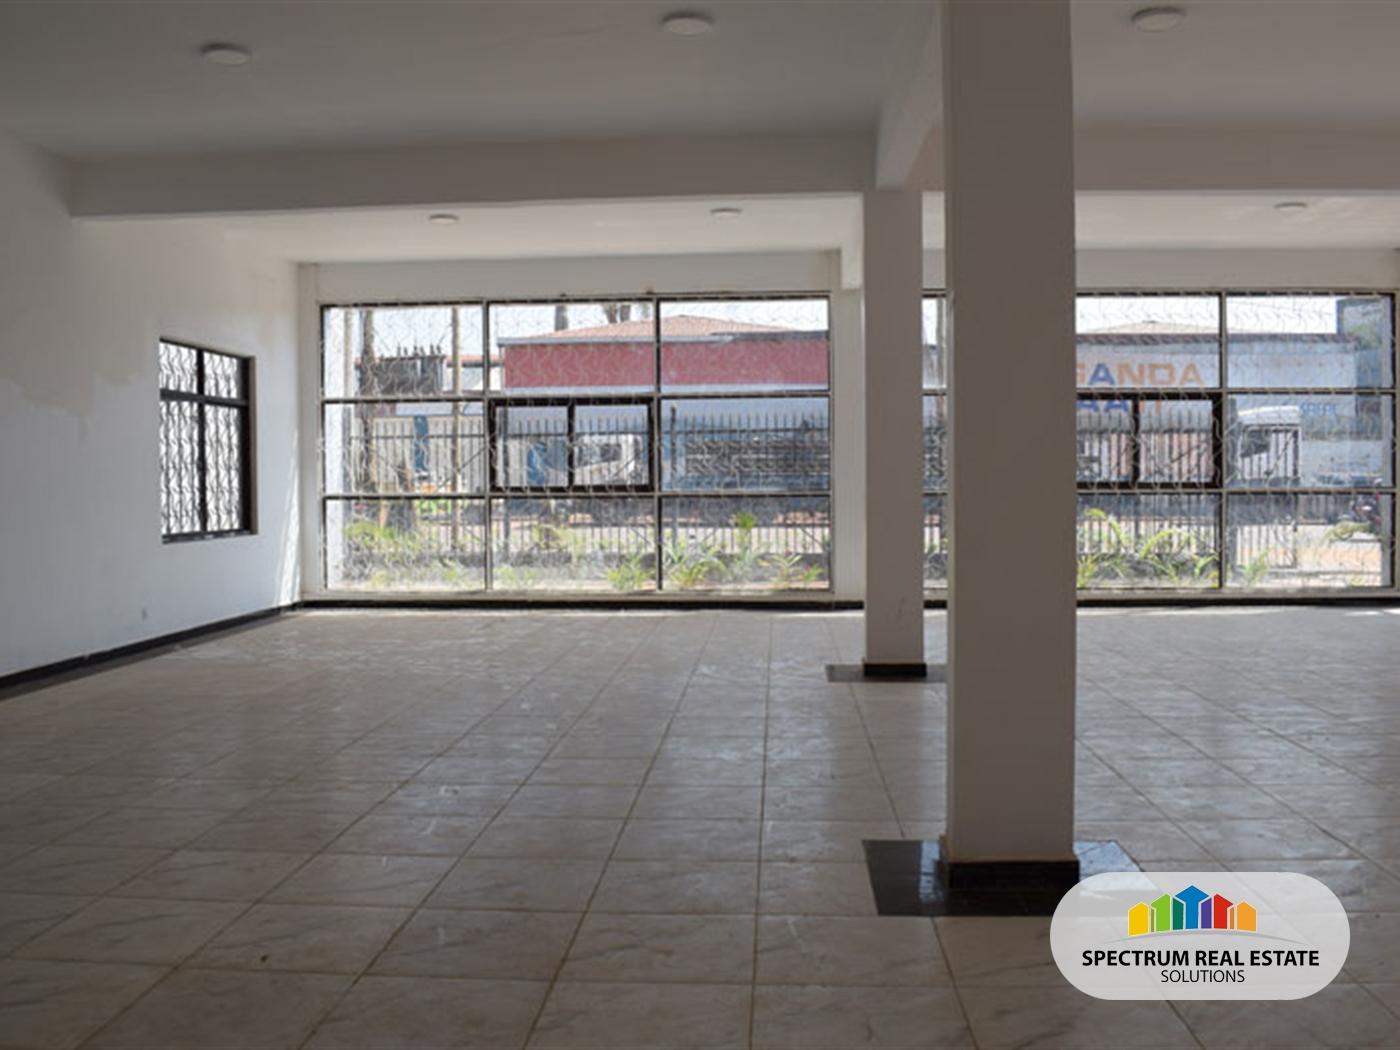 WareHouse for rent in Bugolobi Kampala